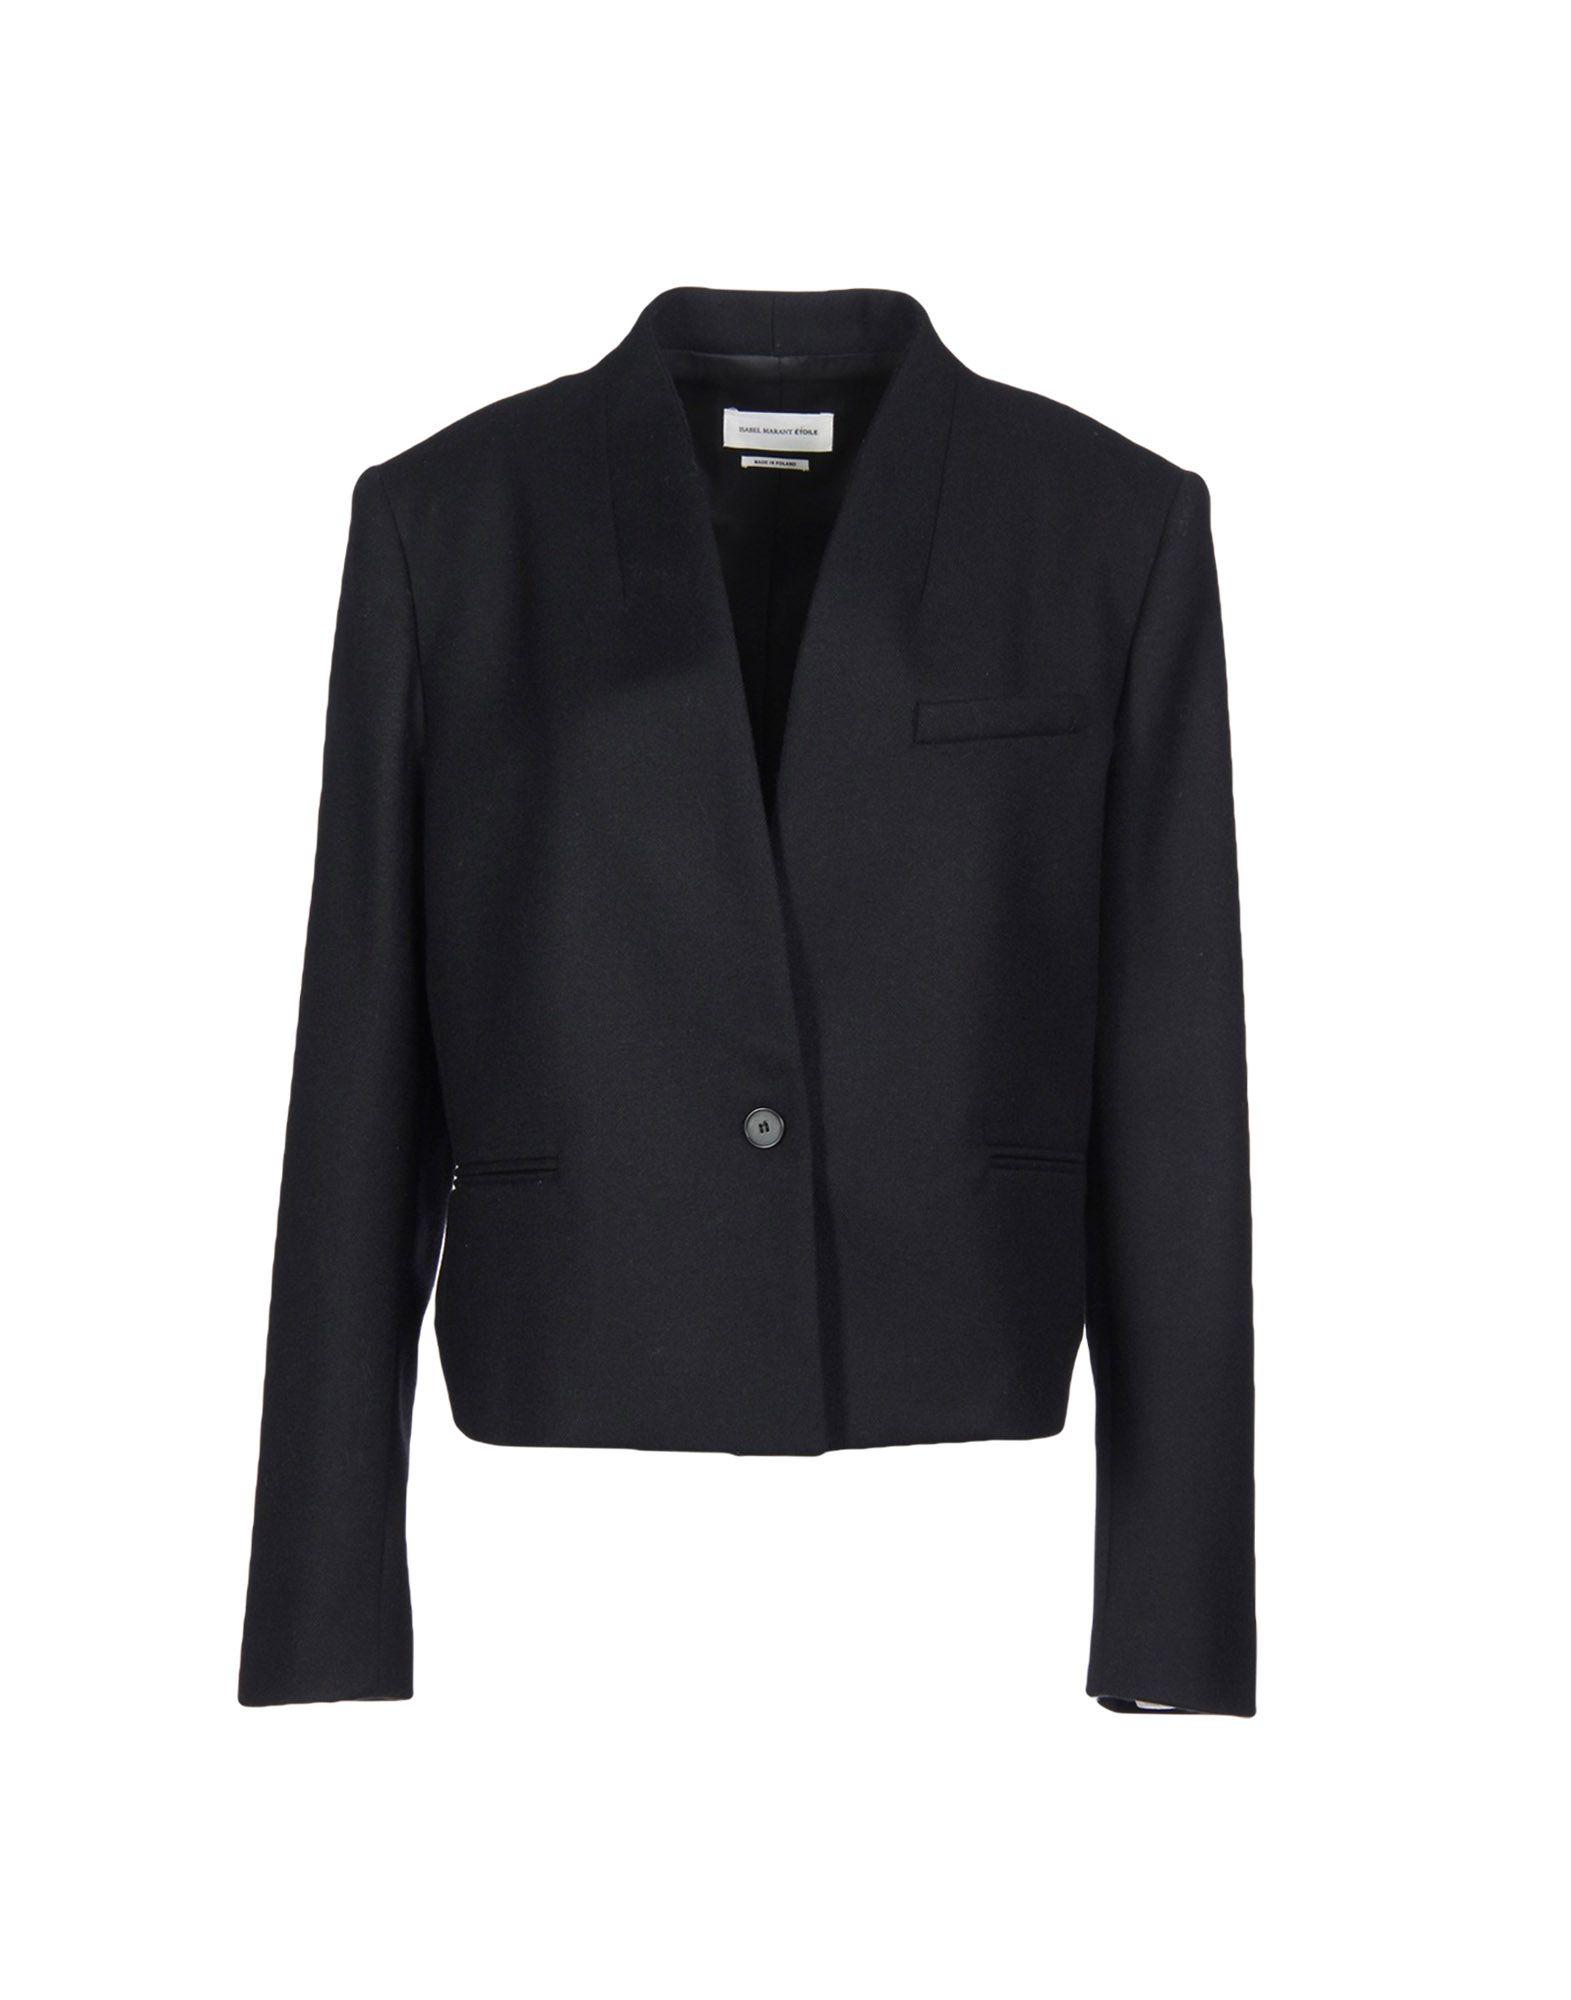 Etoile Isabel Marant Blazer In Black